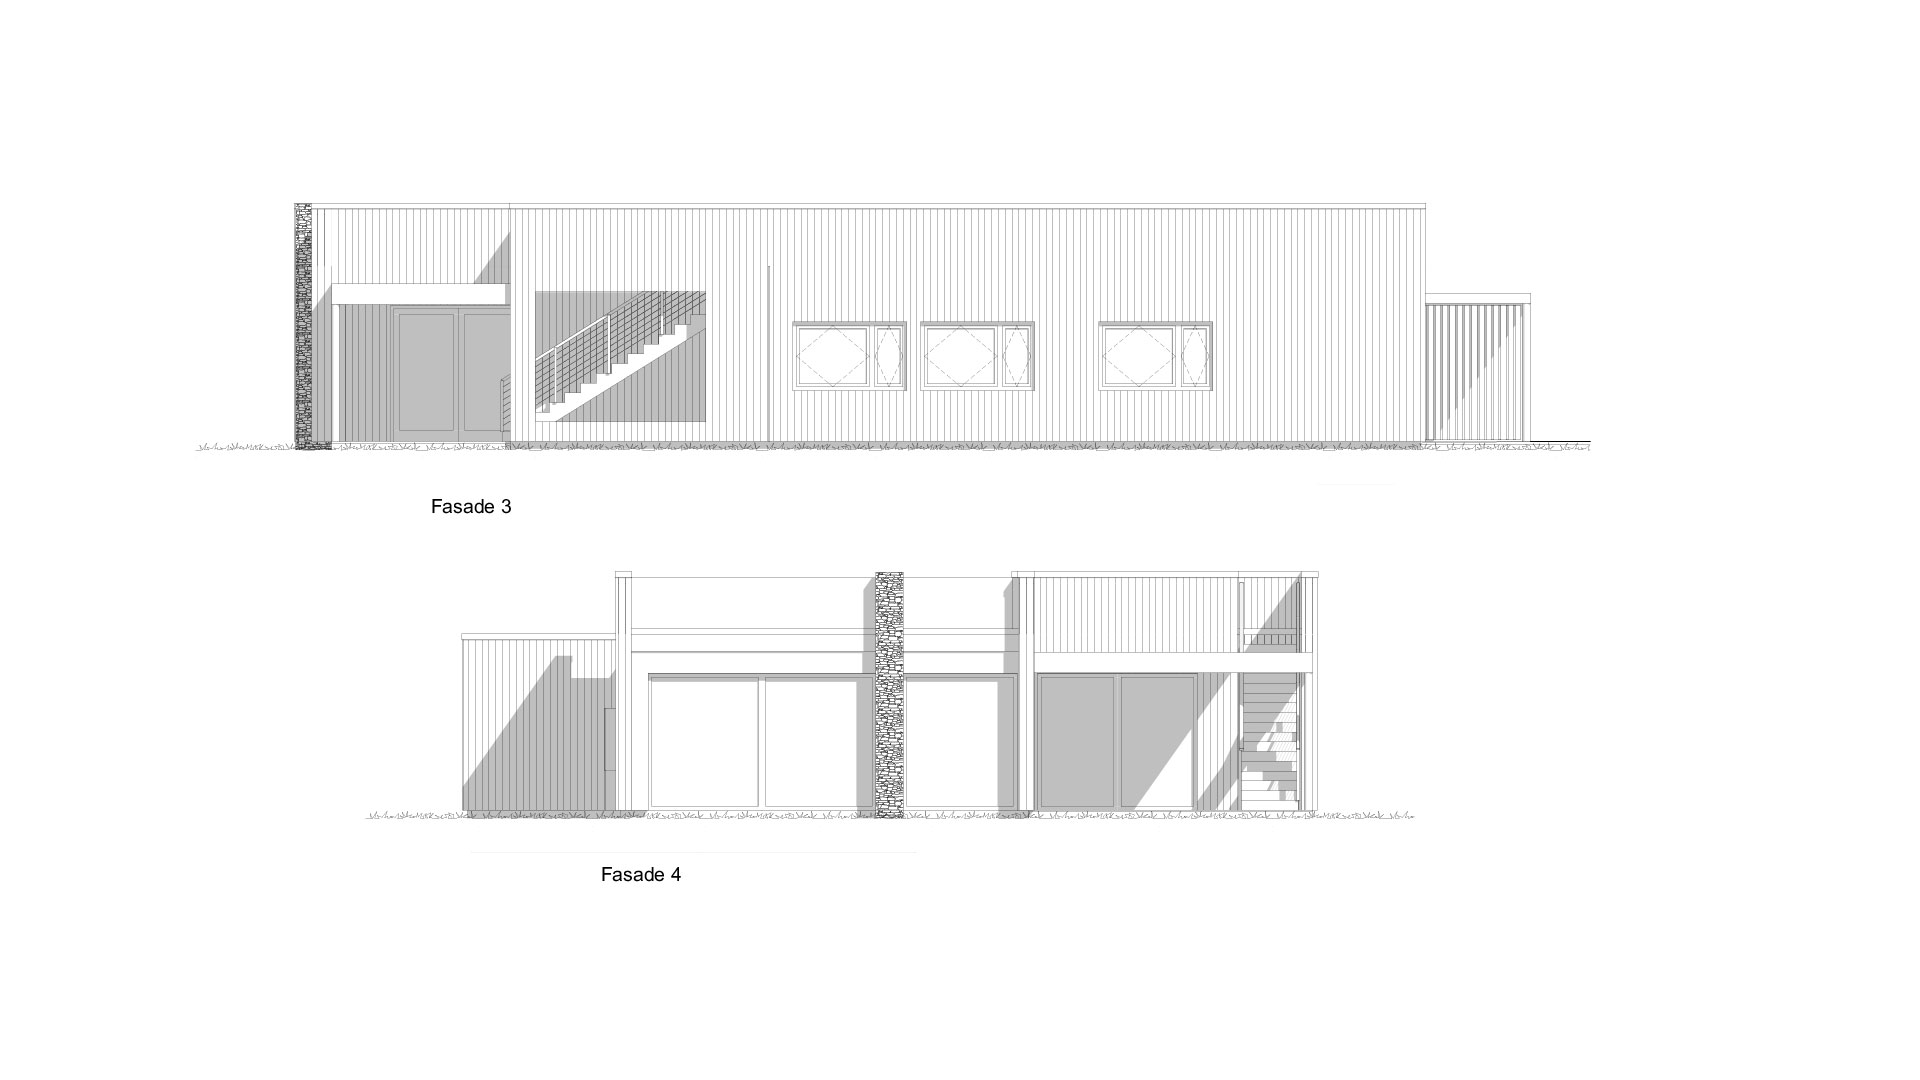 Oasen_Fasade3-4.jpg